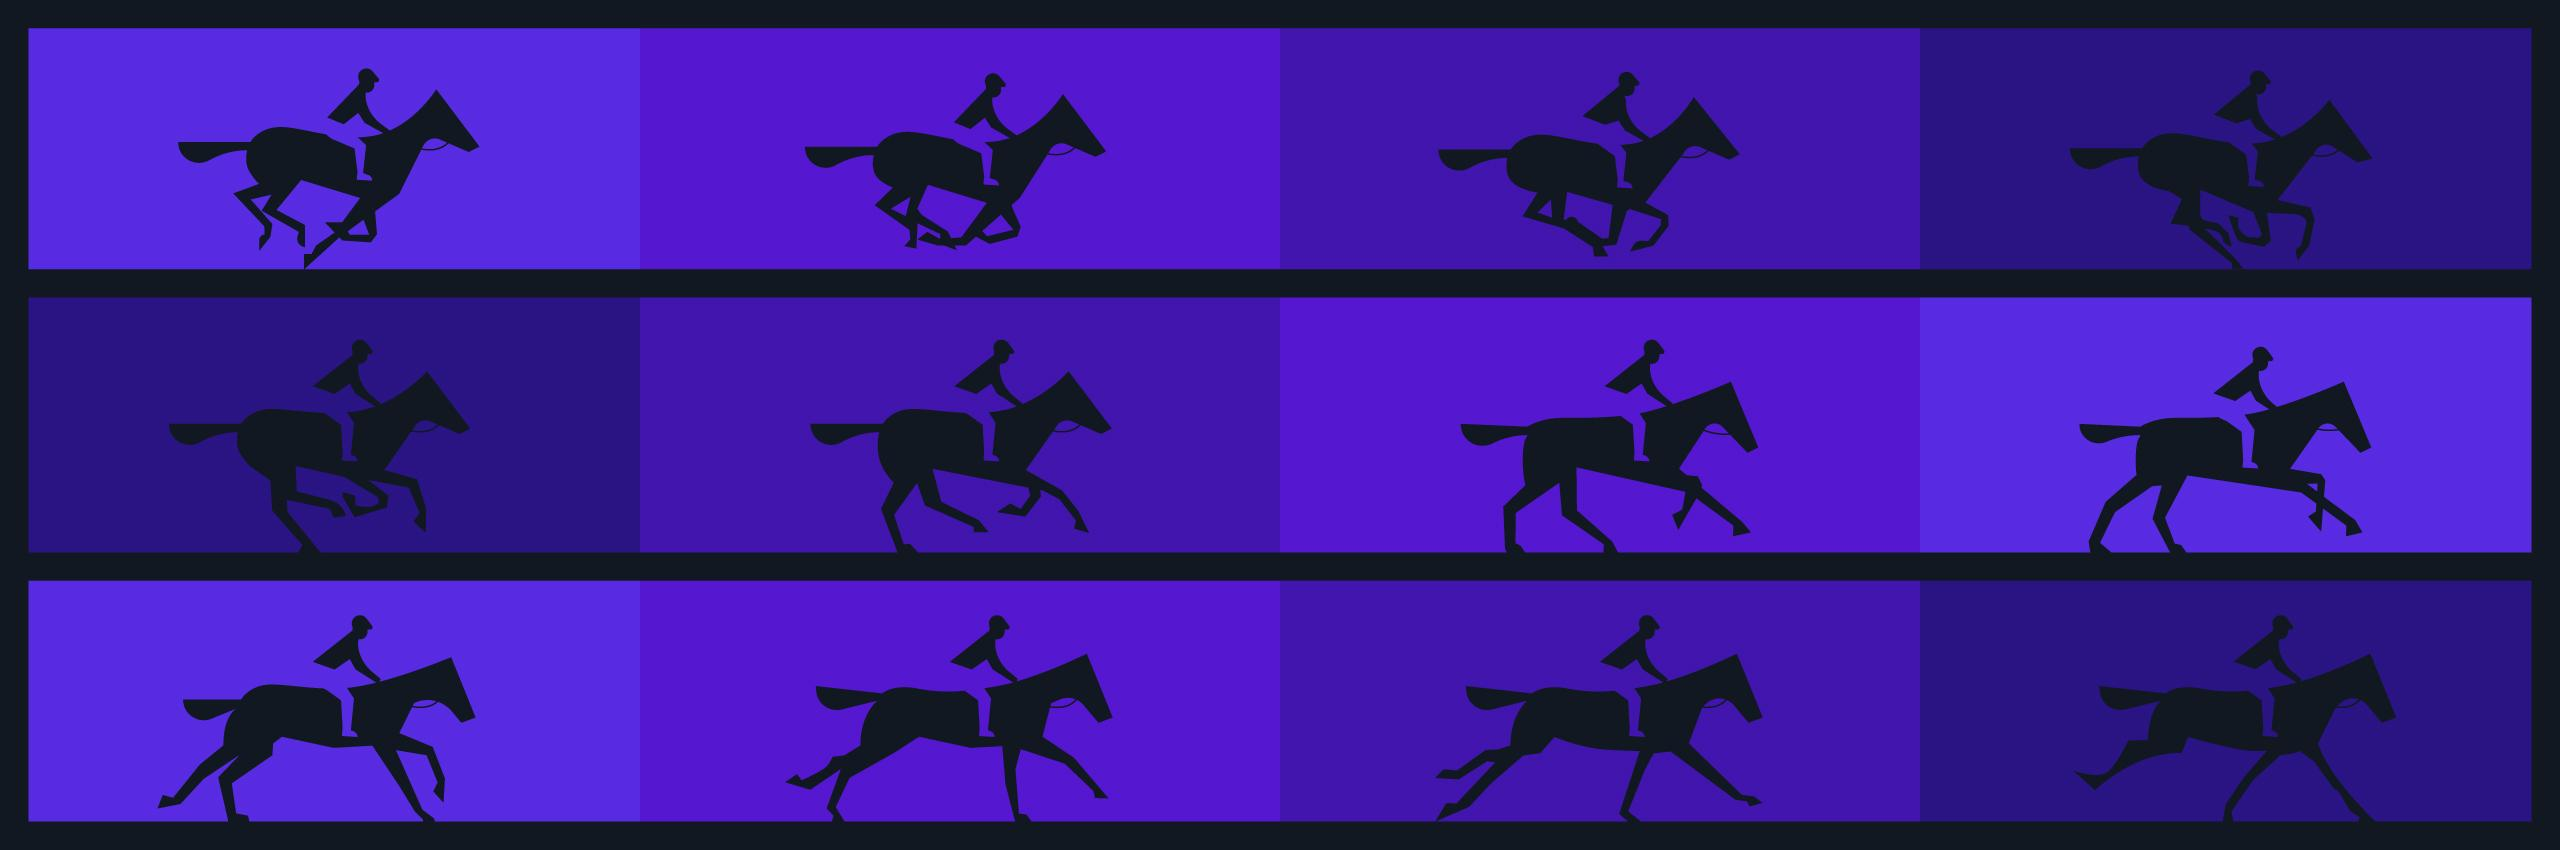 Muybridge horses in motion